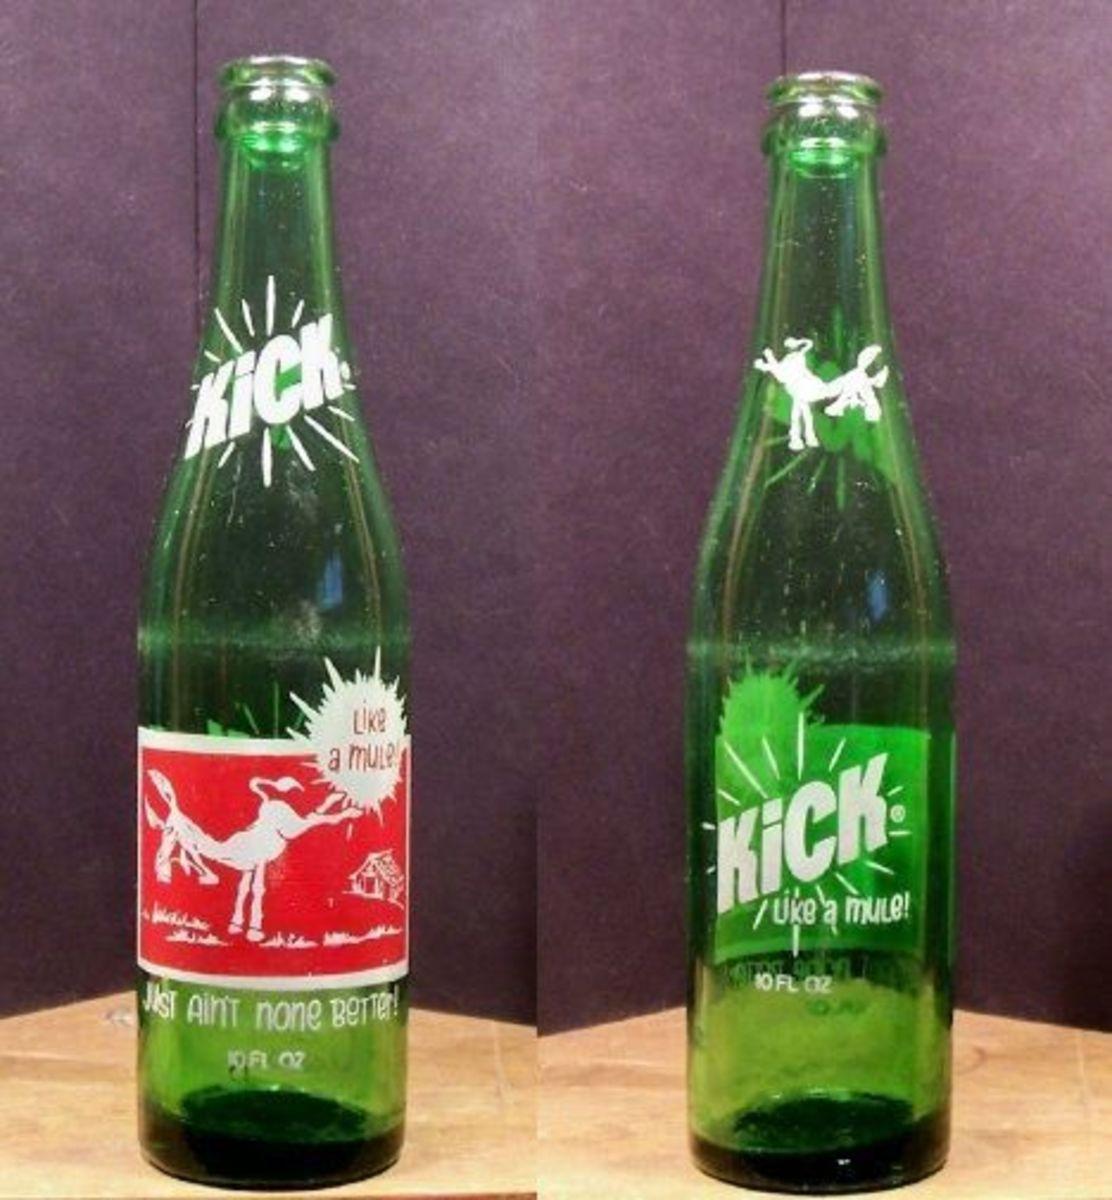 Kick Like a Mule Old Vintage ACL 10 oz Soda Pop Bottle Variation #1 426.